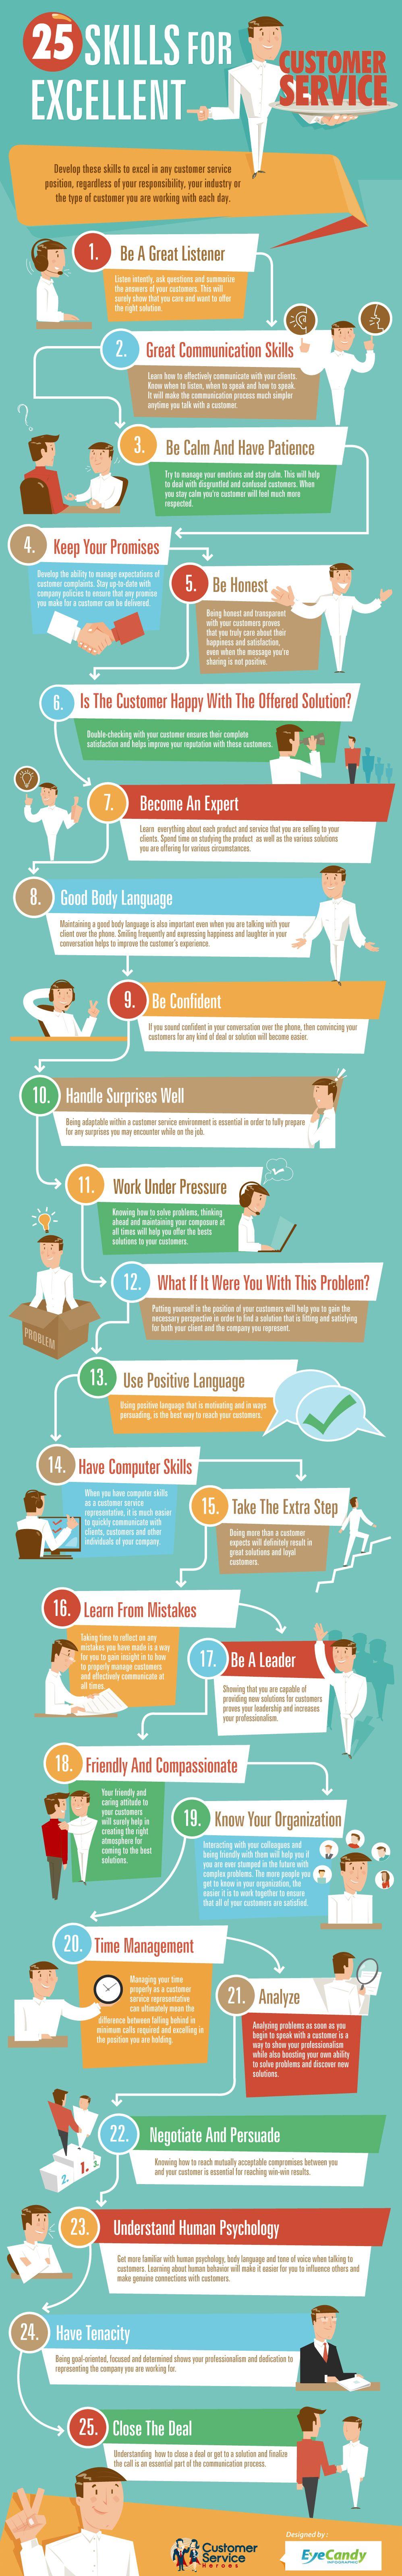 25 habilidades para un buen servicio al cliente #infografia ...